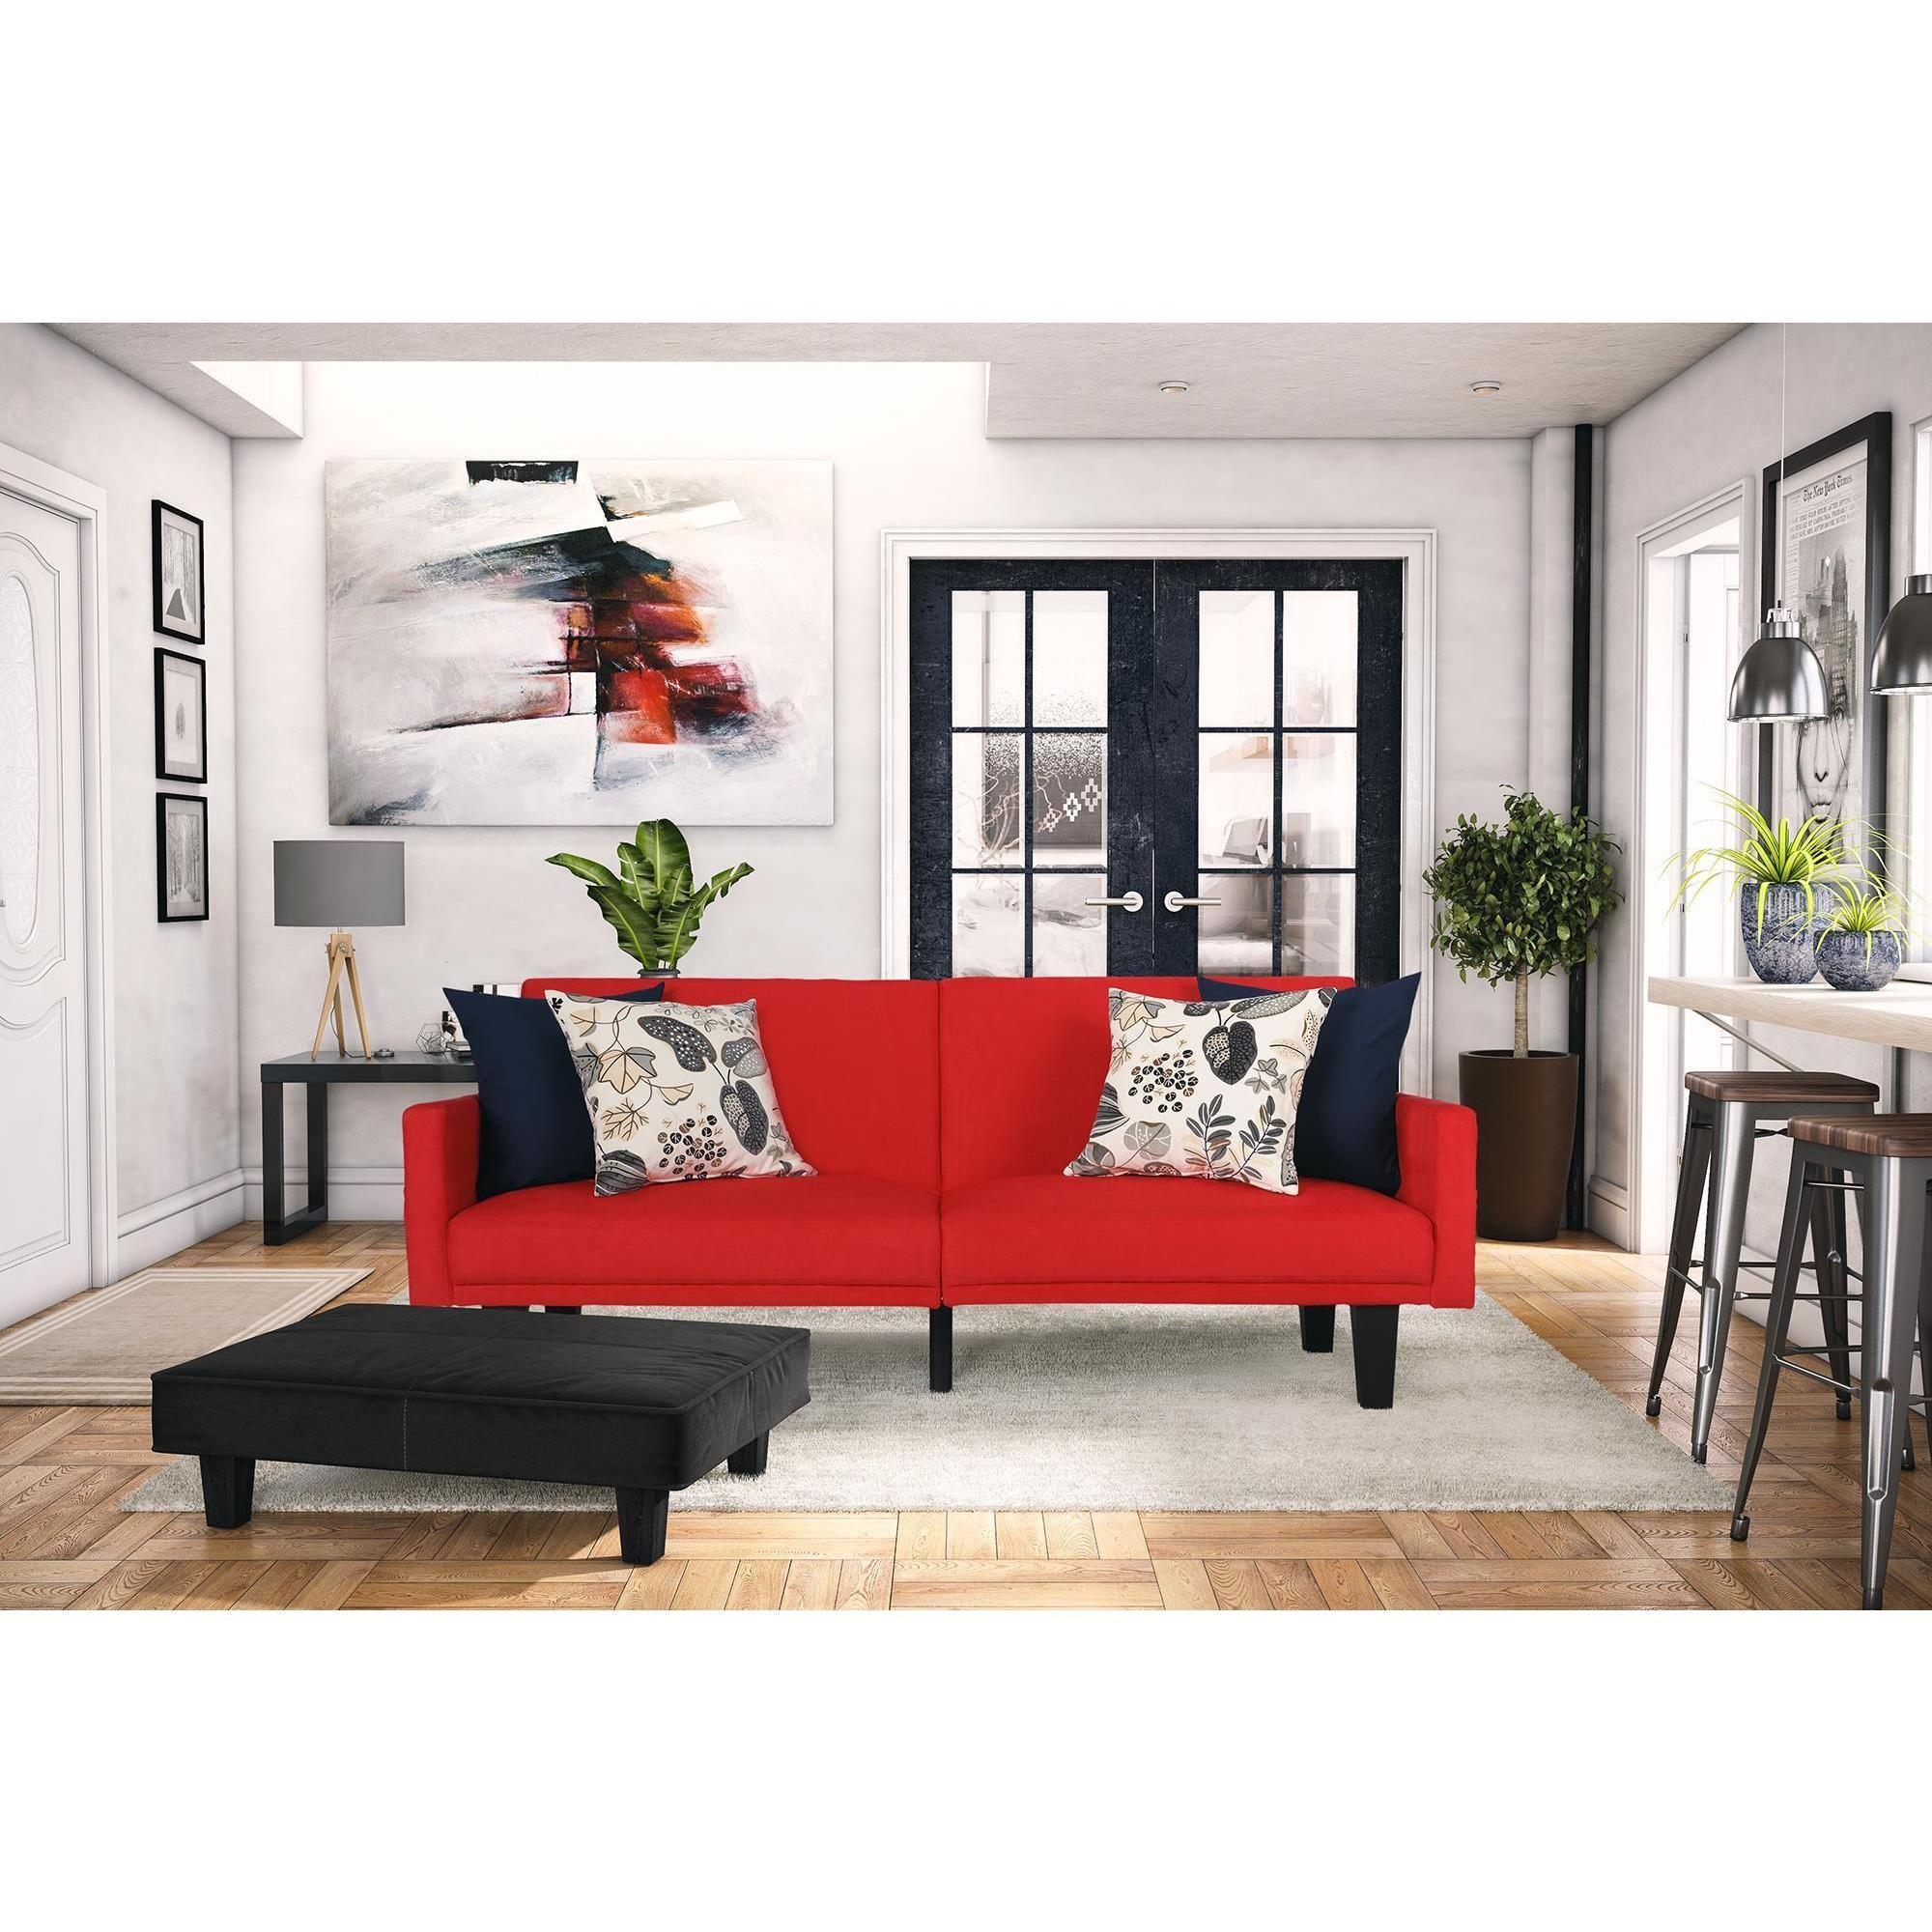 DHP Metro Red Microfiber Split Futon (Split-back futon, red), Size Twin